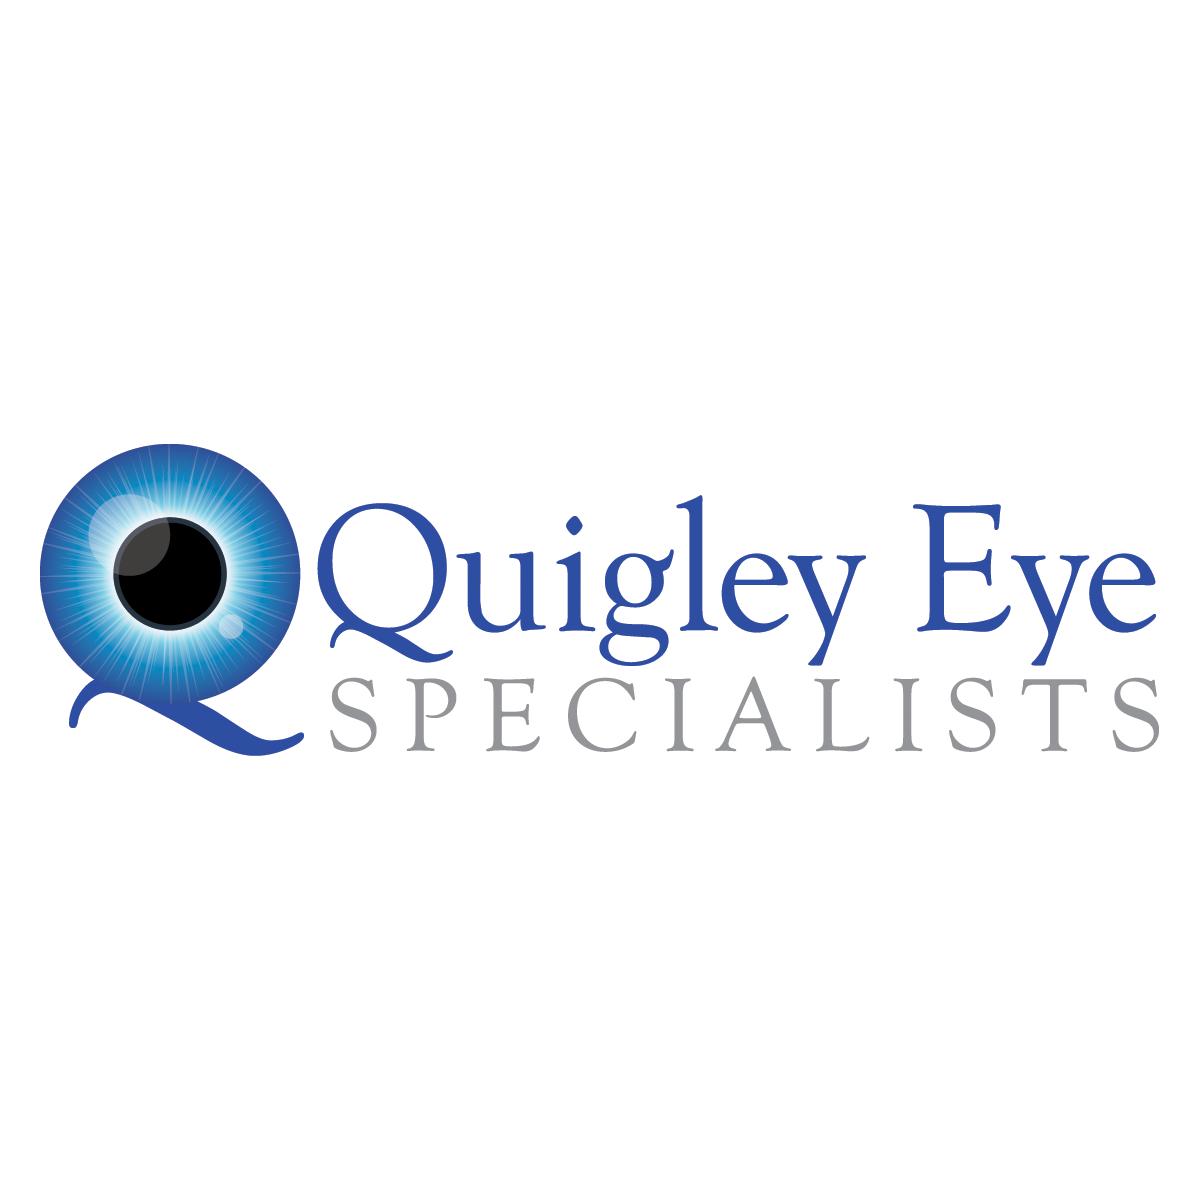 Quigley Eye Specialists